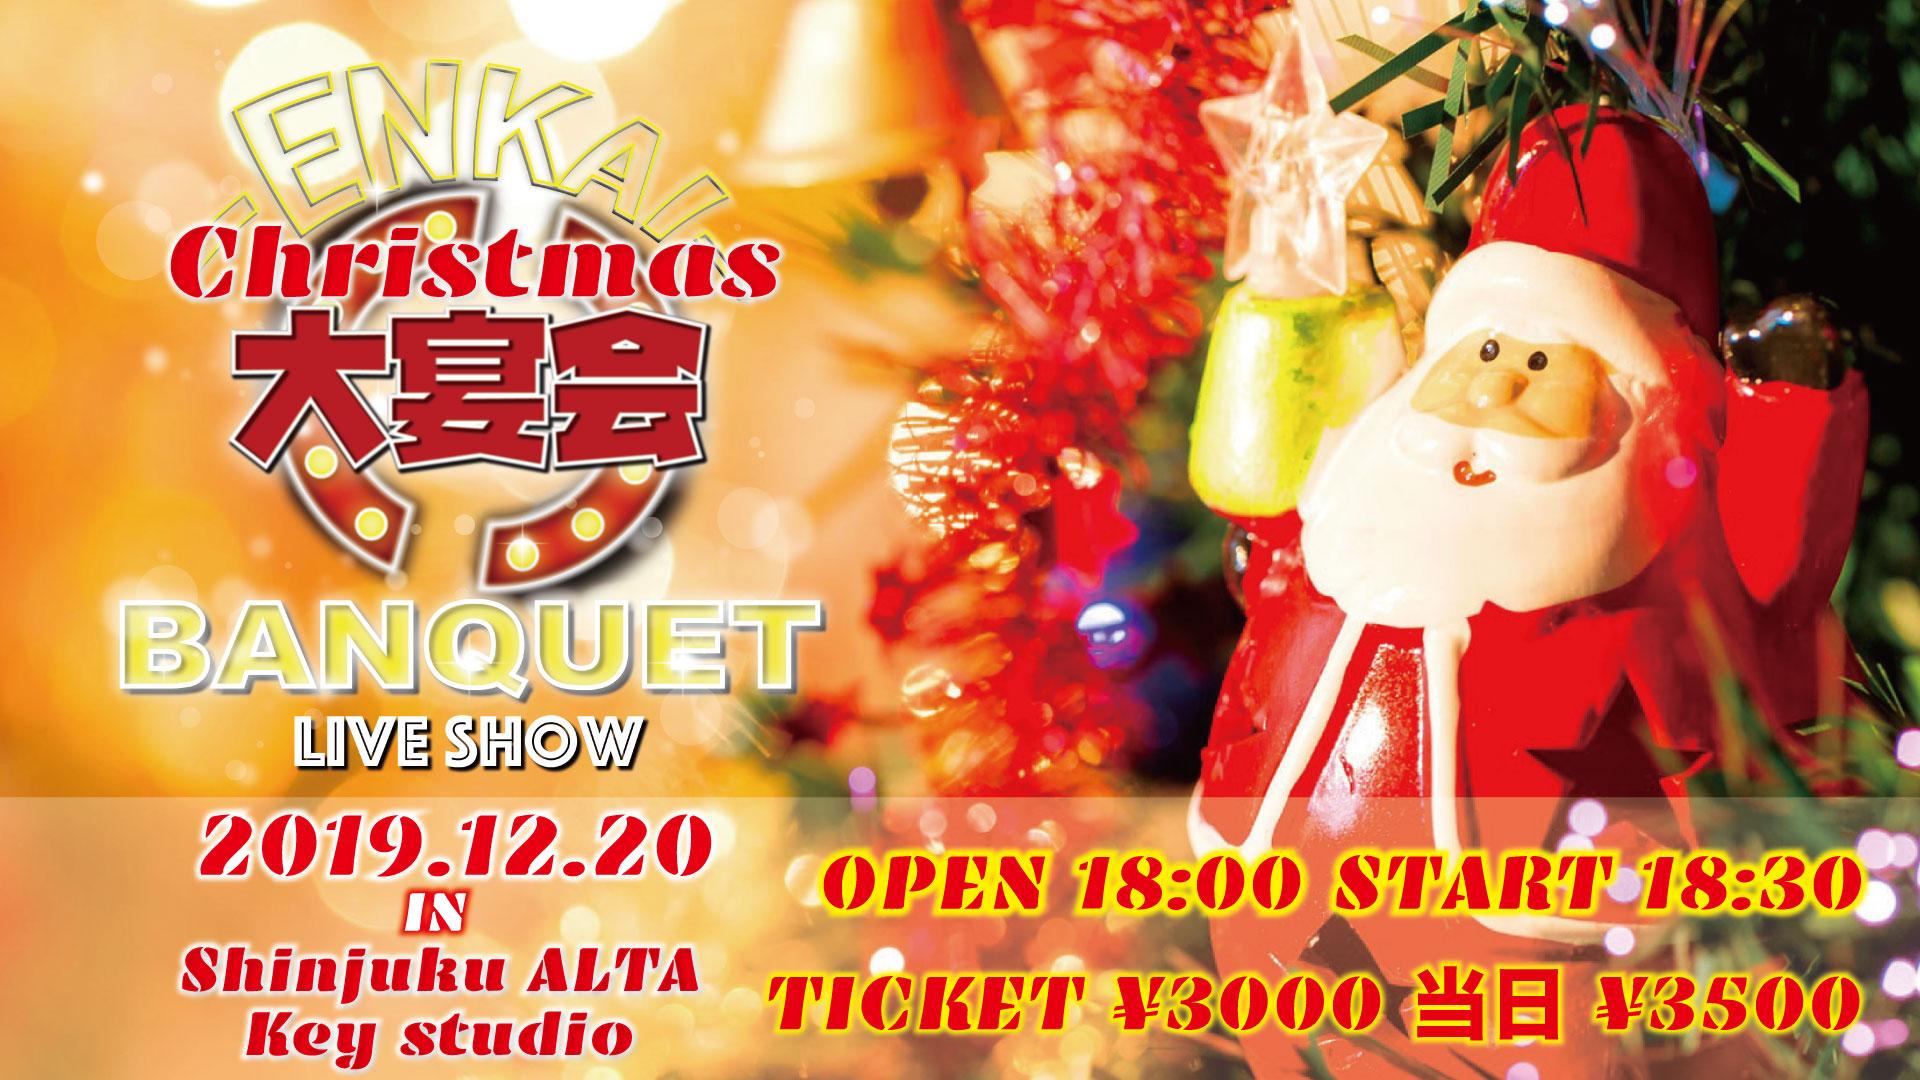 BANQUET 大宴会 クリスマスSP